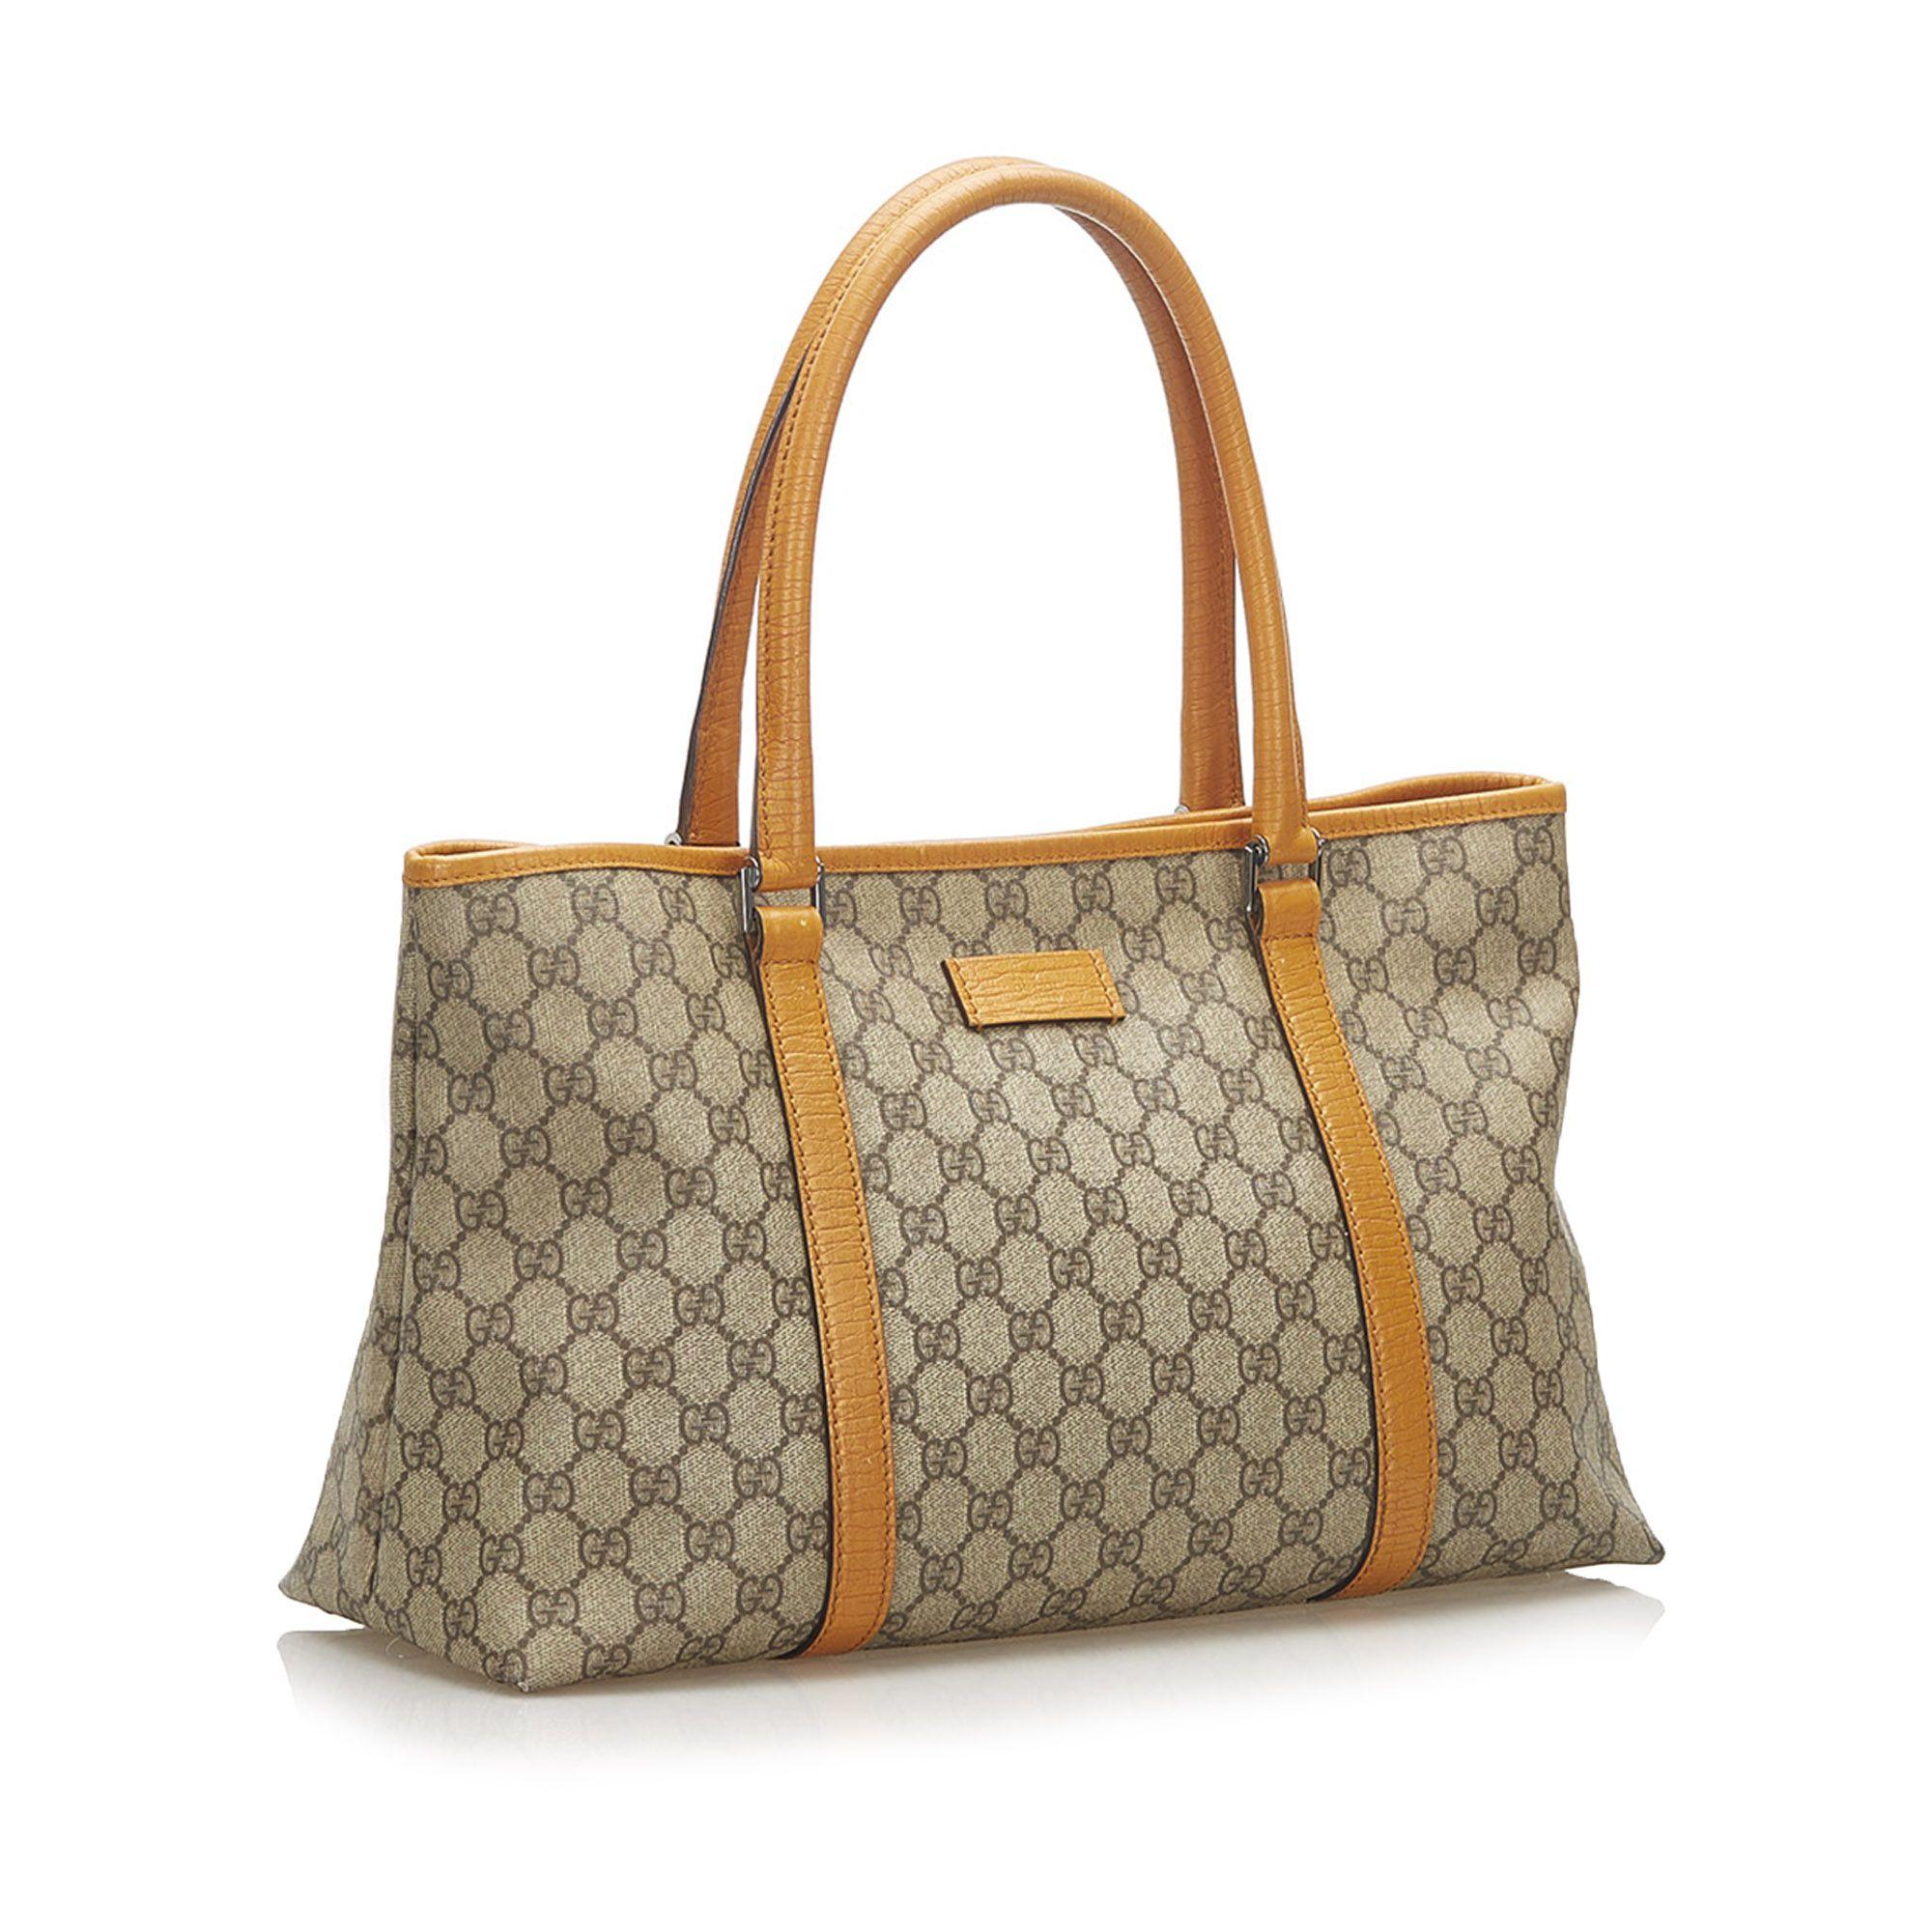 Vintage Gucci GG Supreme Joy Tote Bag Brown